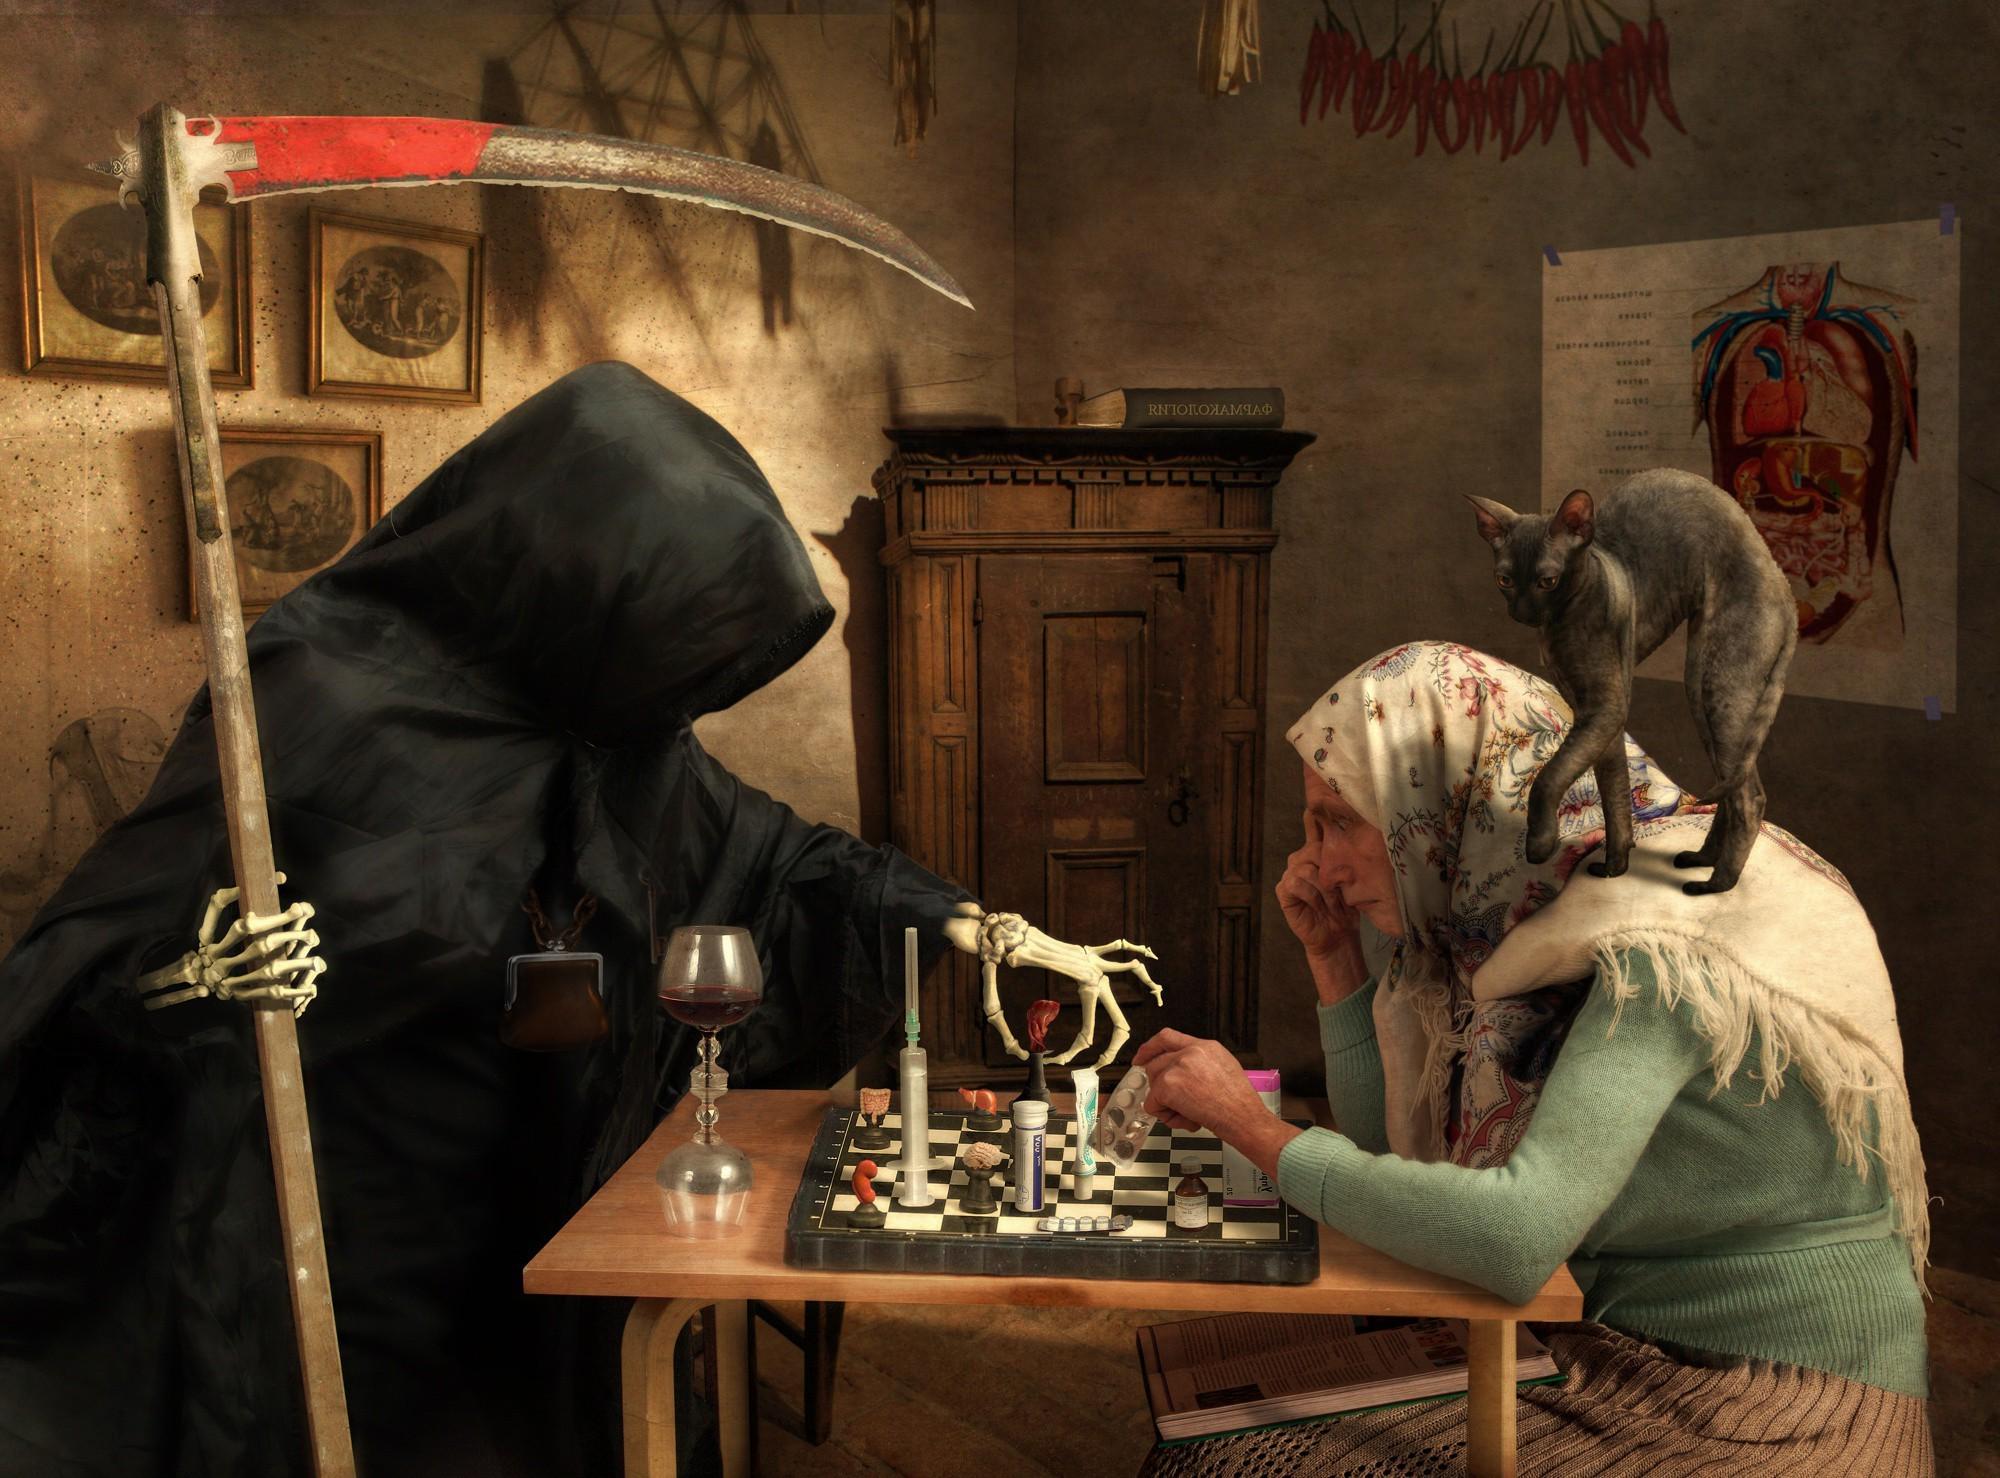 Wallpaper : cat, artwork, old people, death, Grim Reaper, ART, games